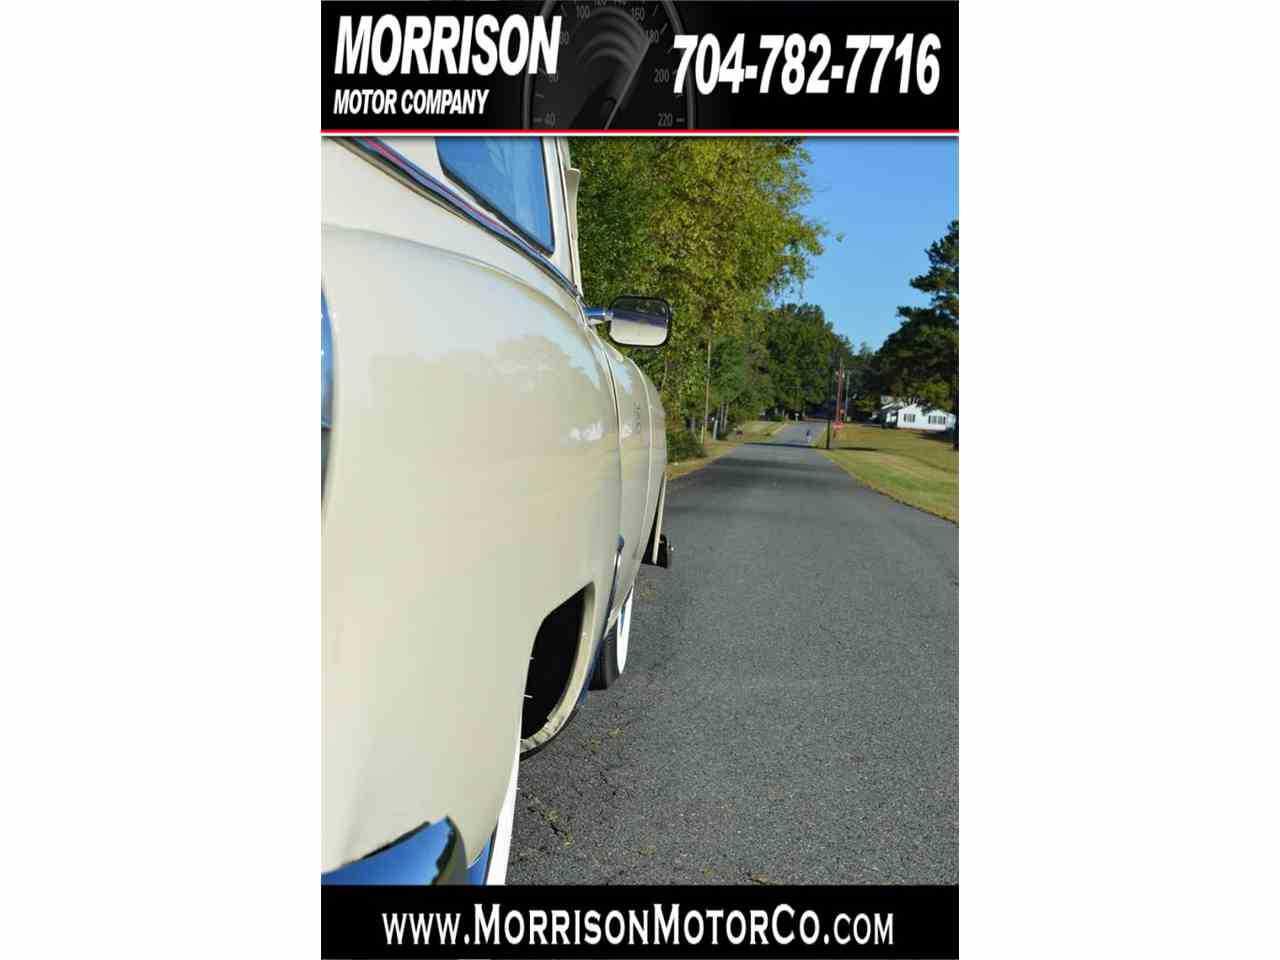 1953 Chevrolet Sedan Delivery For Sale In Concord Nc D530067268 Pontiac Grand Prix